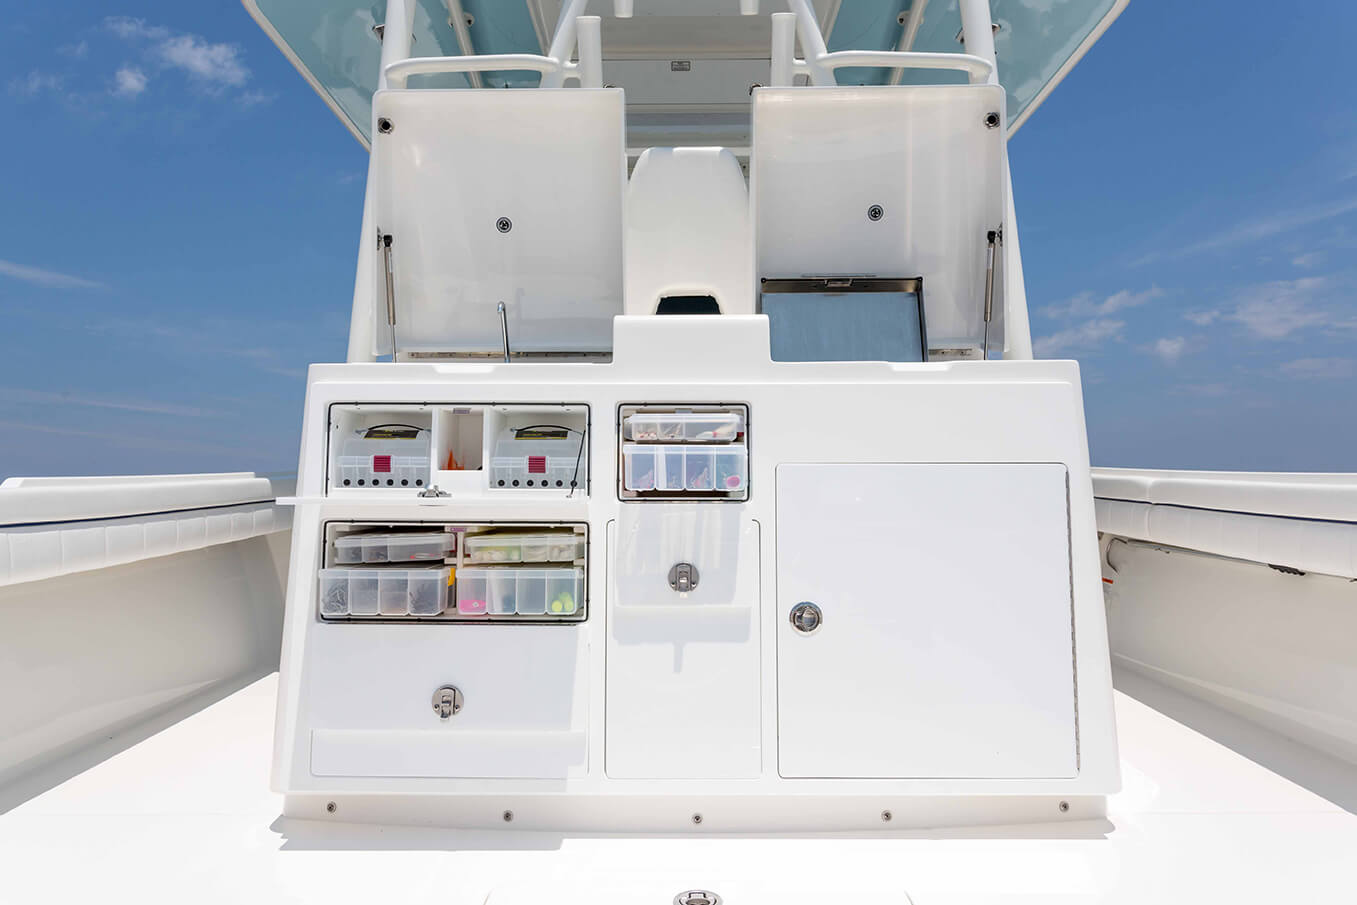 Teak Isle » Products » Marine » Plexi-Acrylic Parts - Plexi